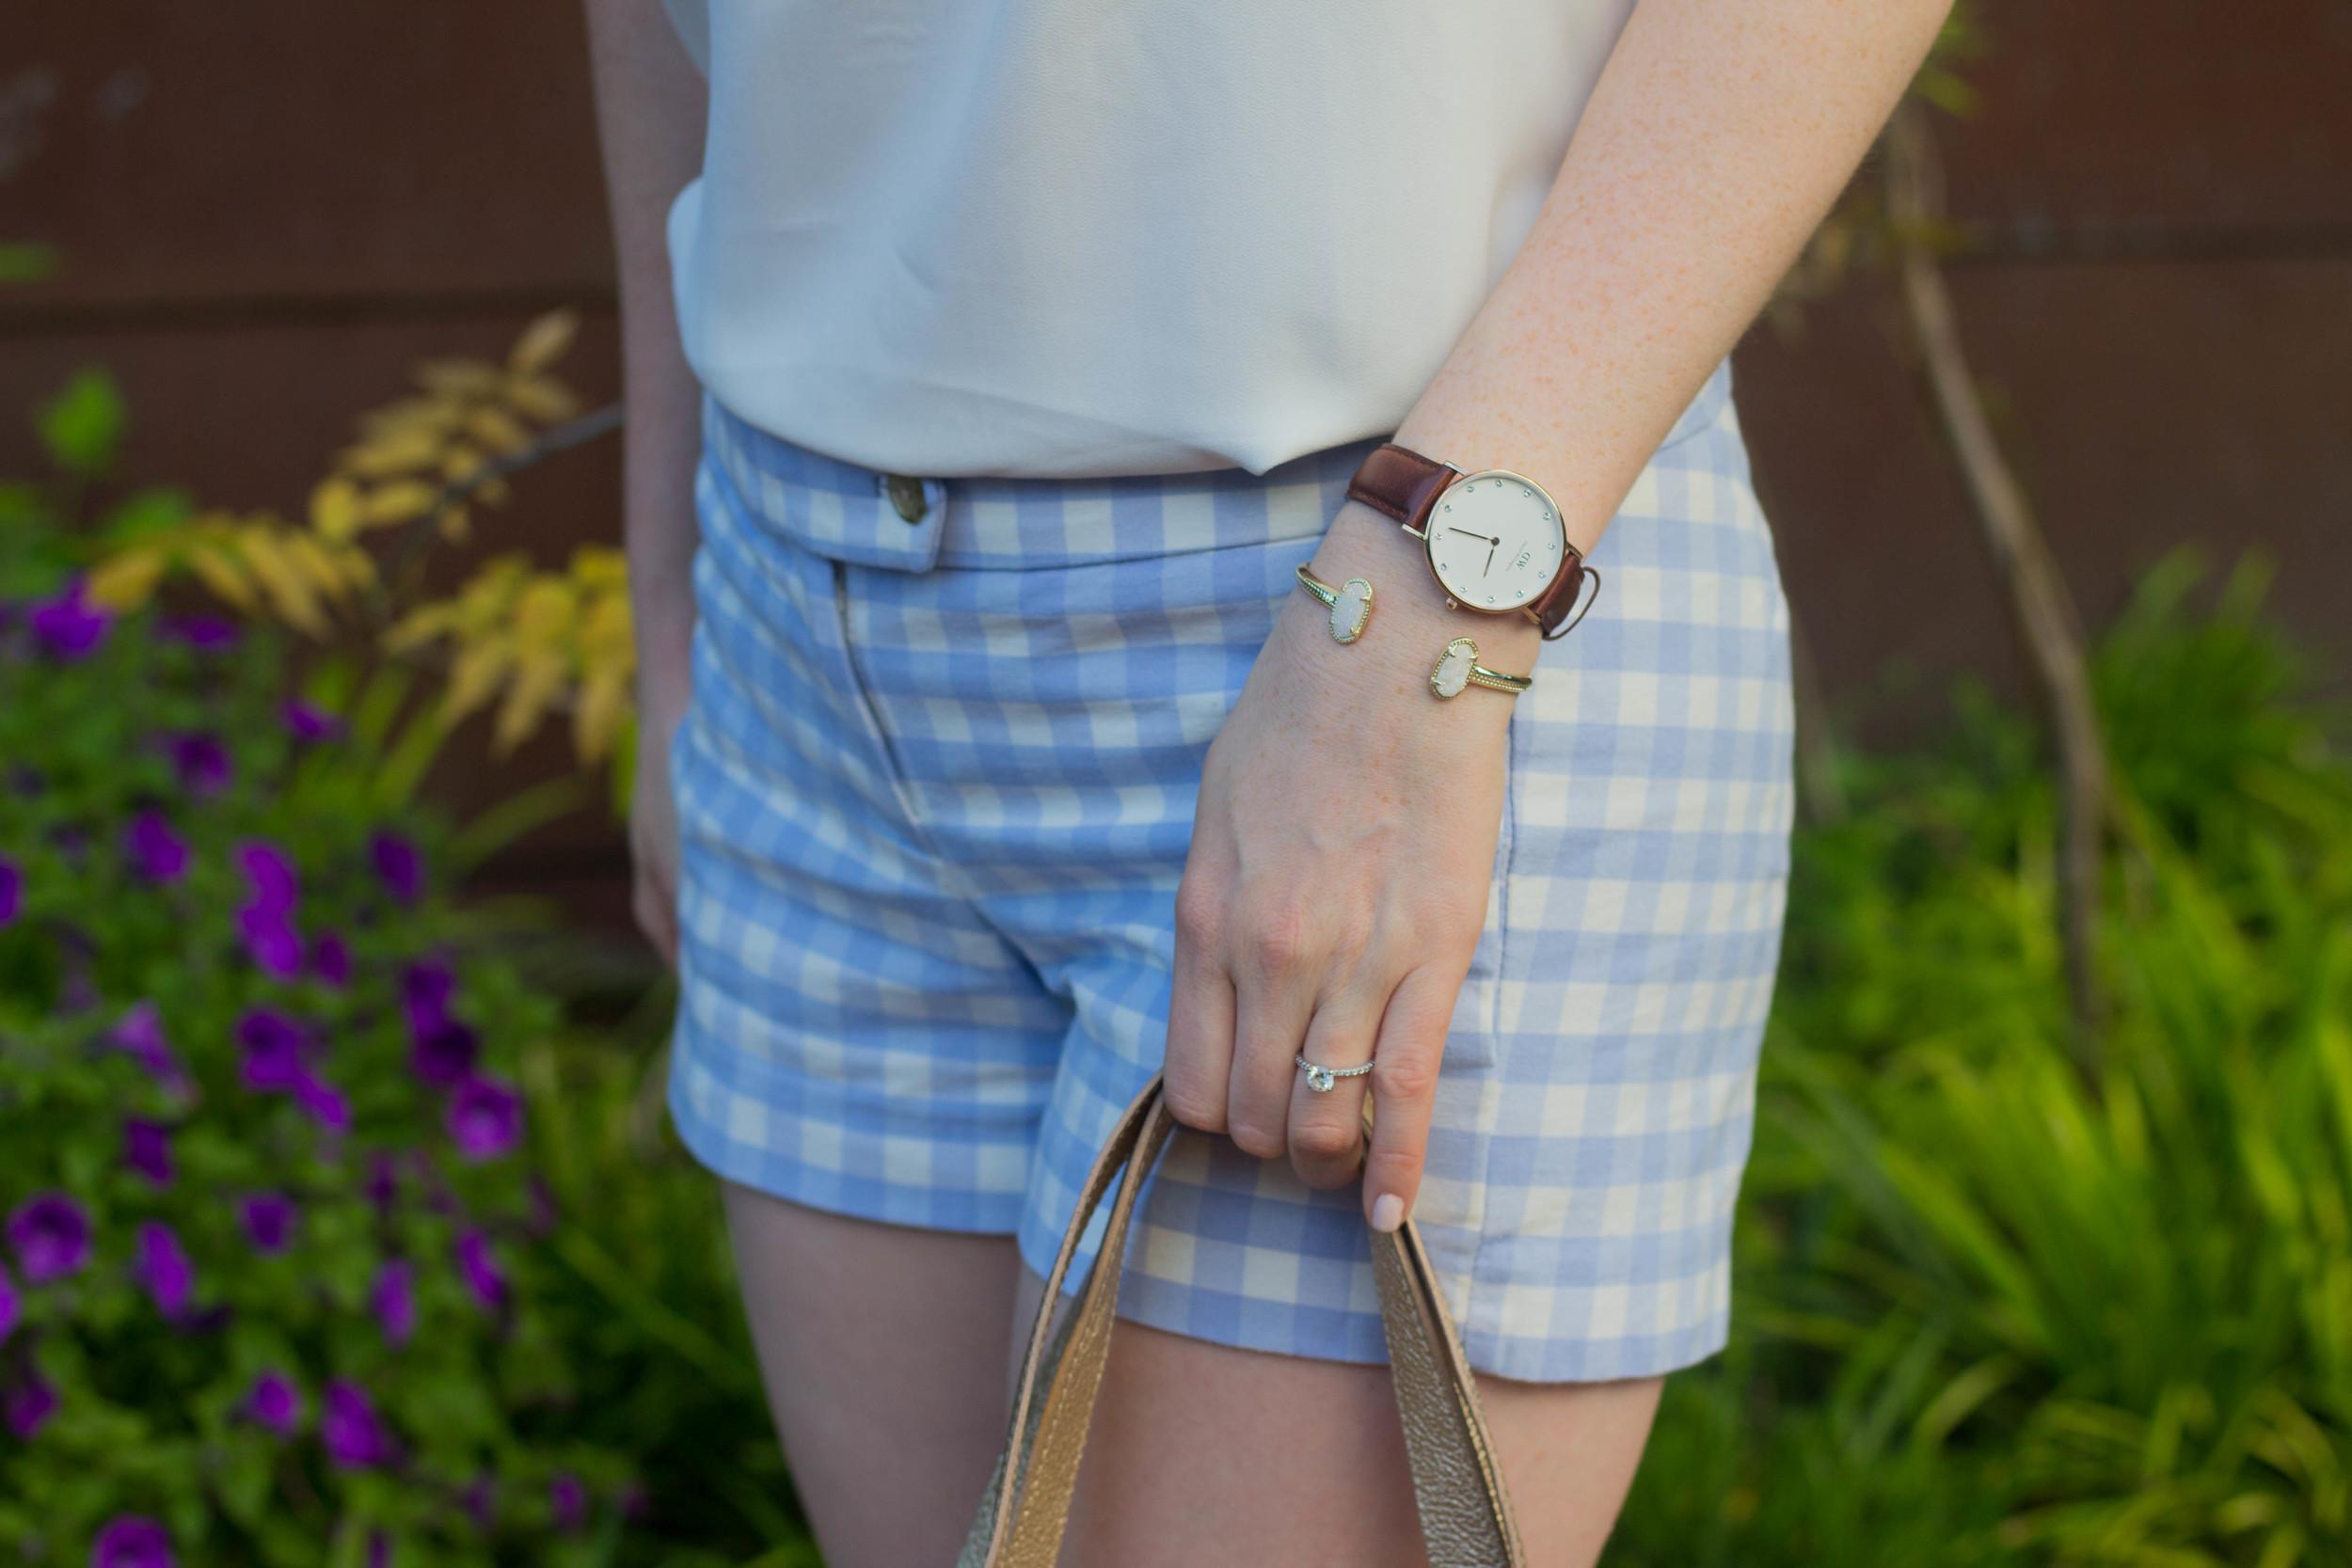 j crew factory light blue gingham shorts, loft white tank top, cuyana carryall, bc cougar wedge sandal, kendra scott sophee earrings